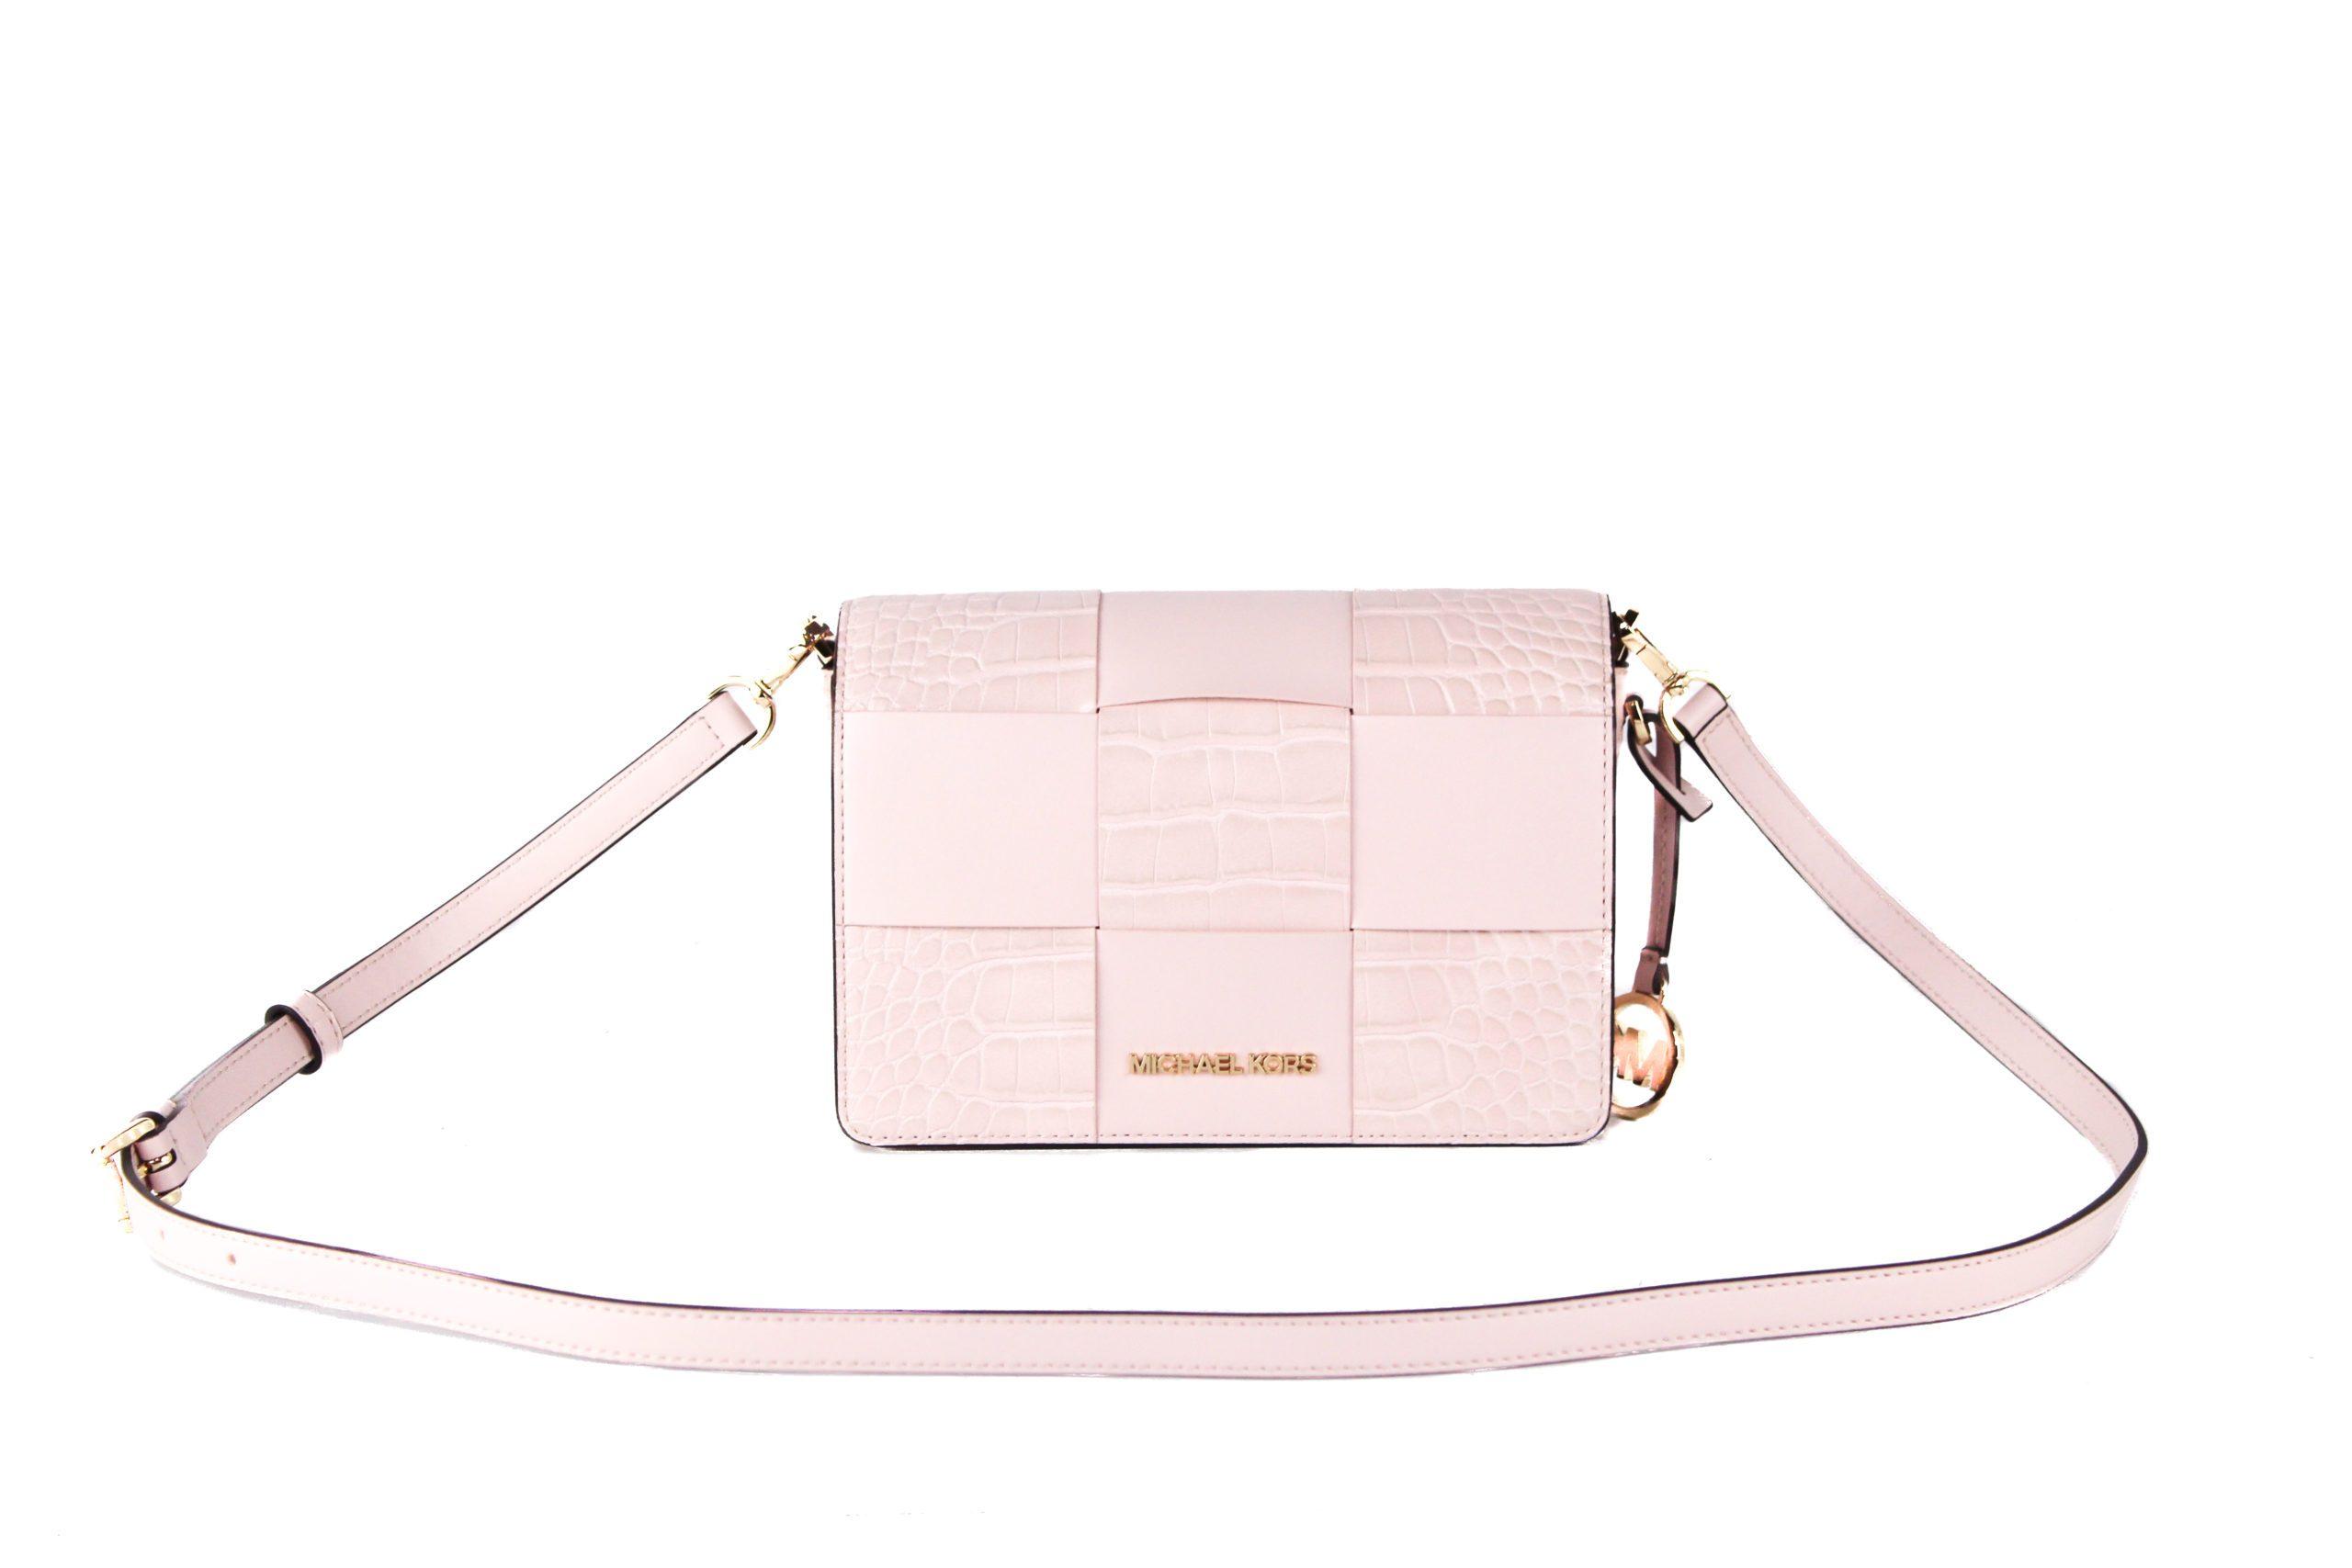 Michael Kors Women's Mercer Clutch Bag Pink 87129